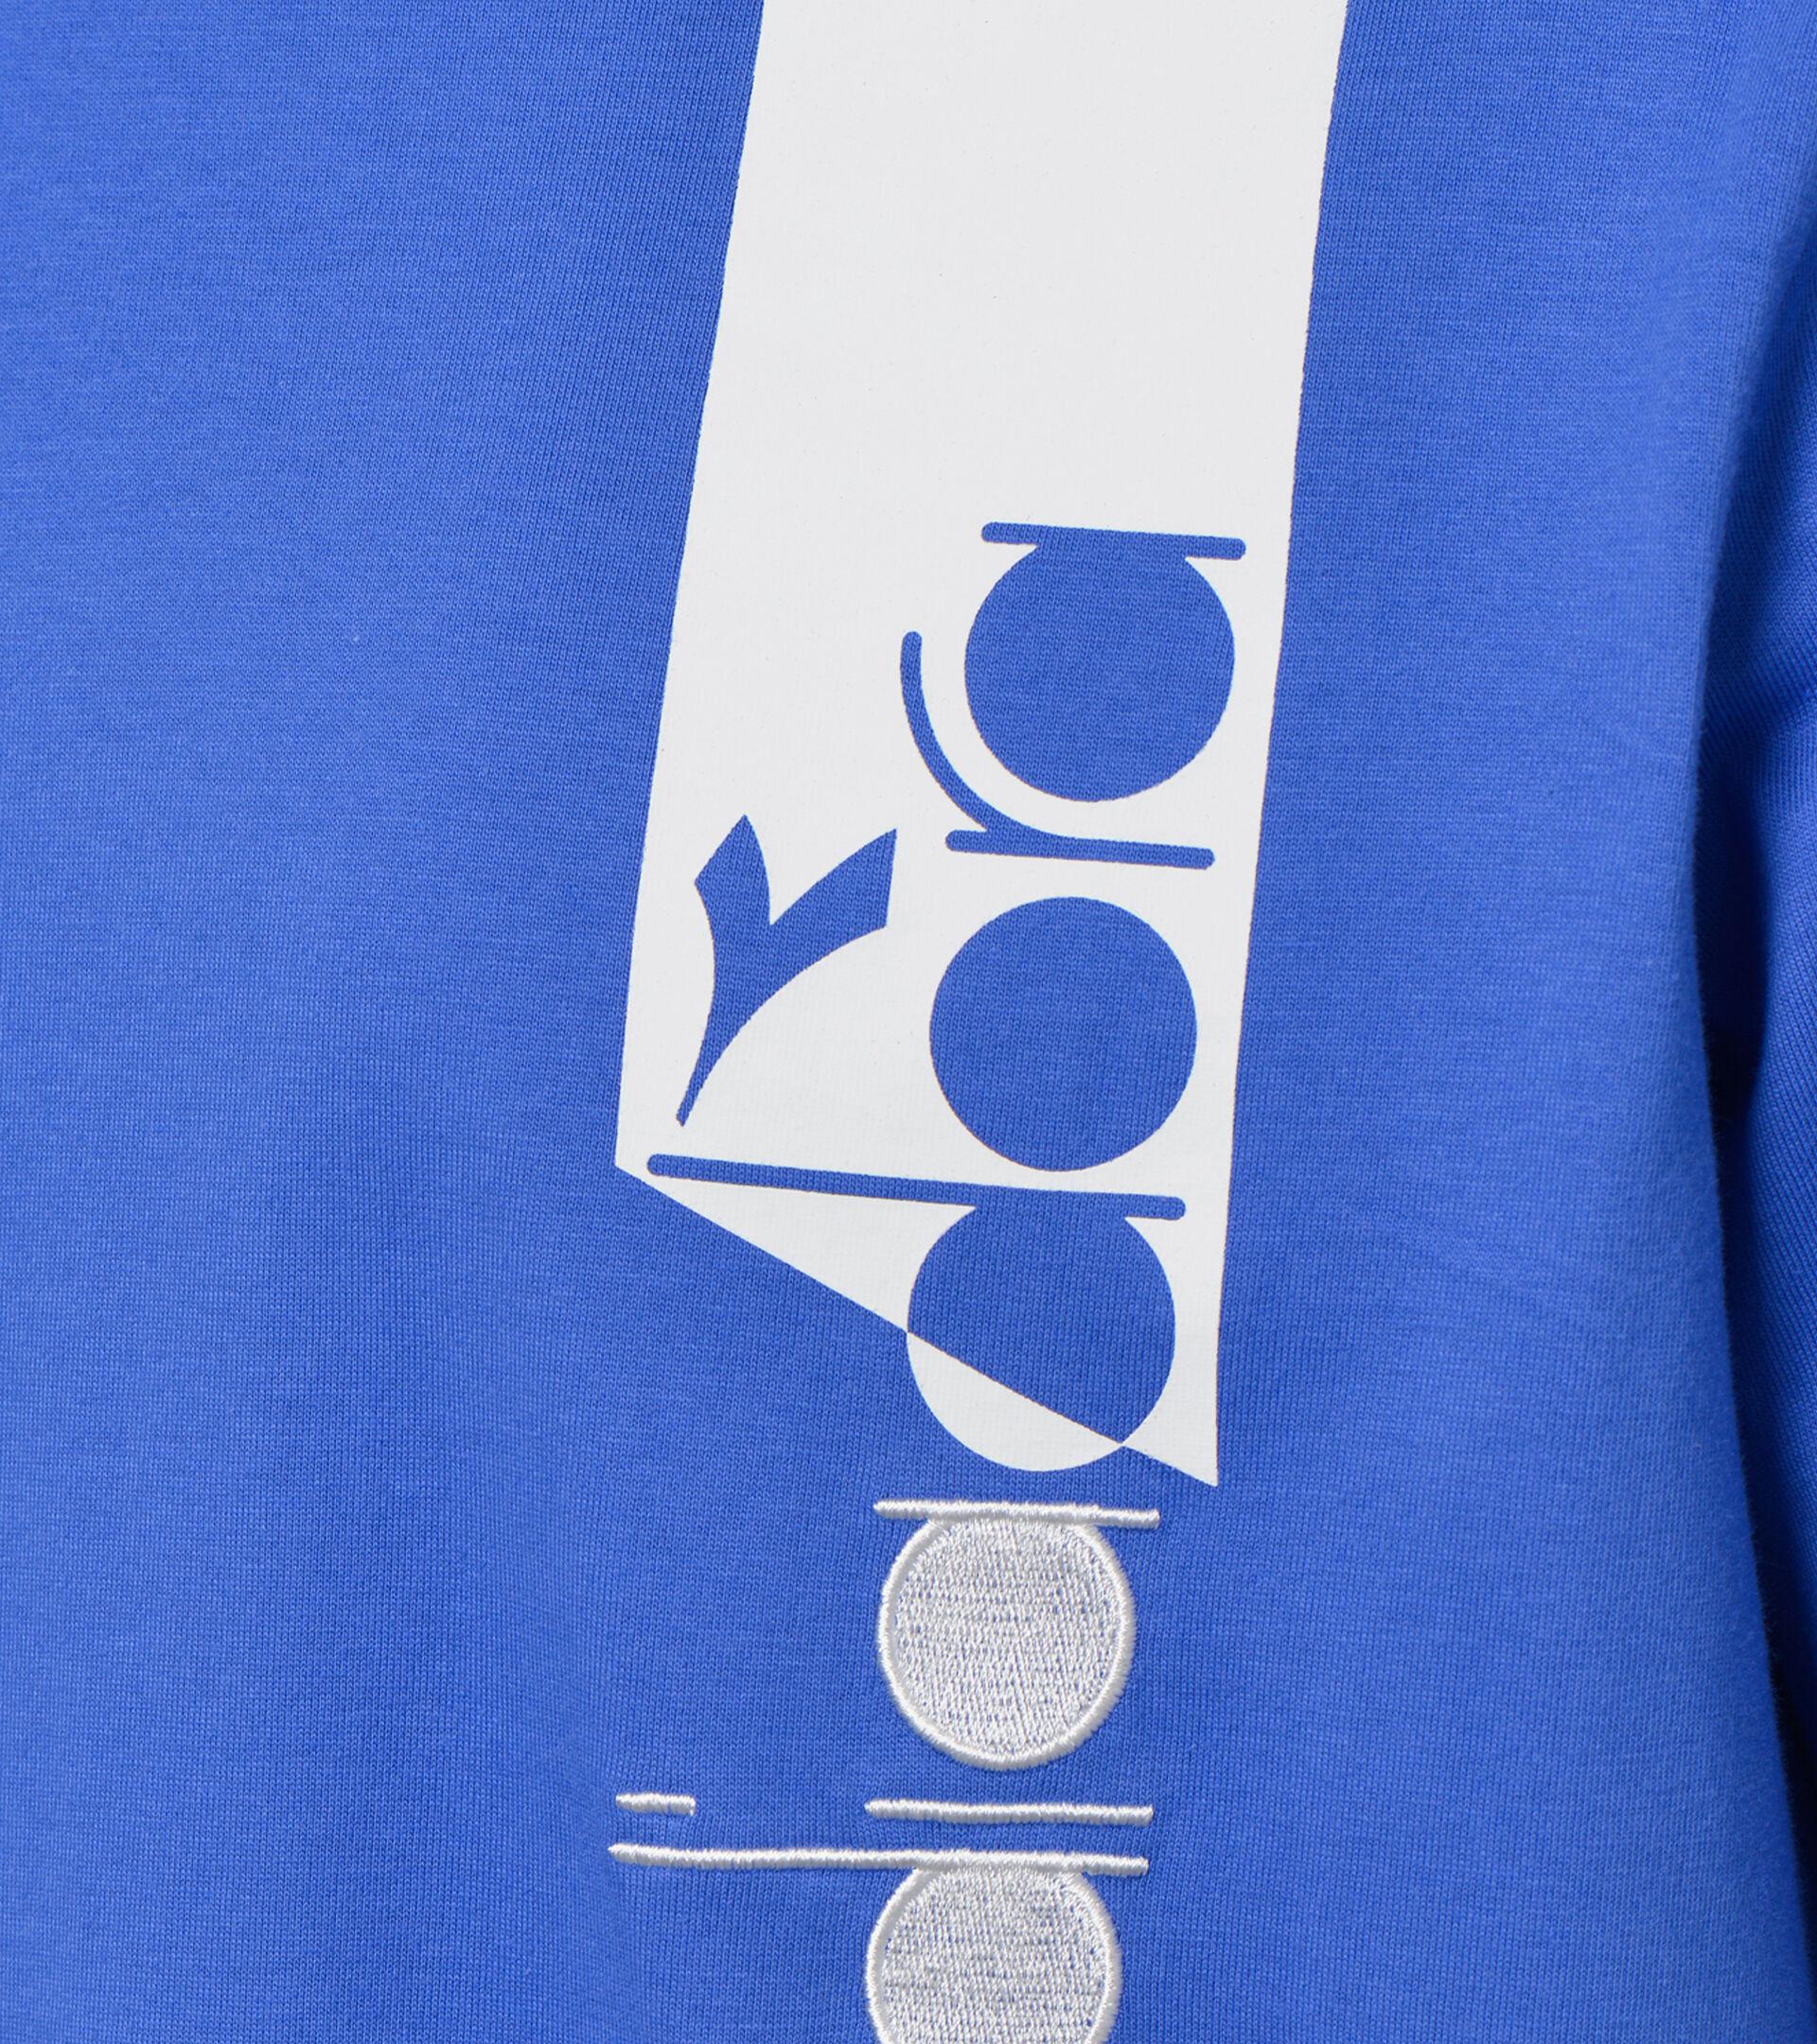 Apparel Sportswear UOMO T-SHIRT SS ICON AZUL AMPARO Diadora